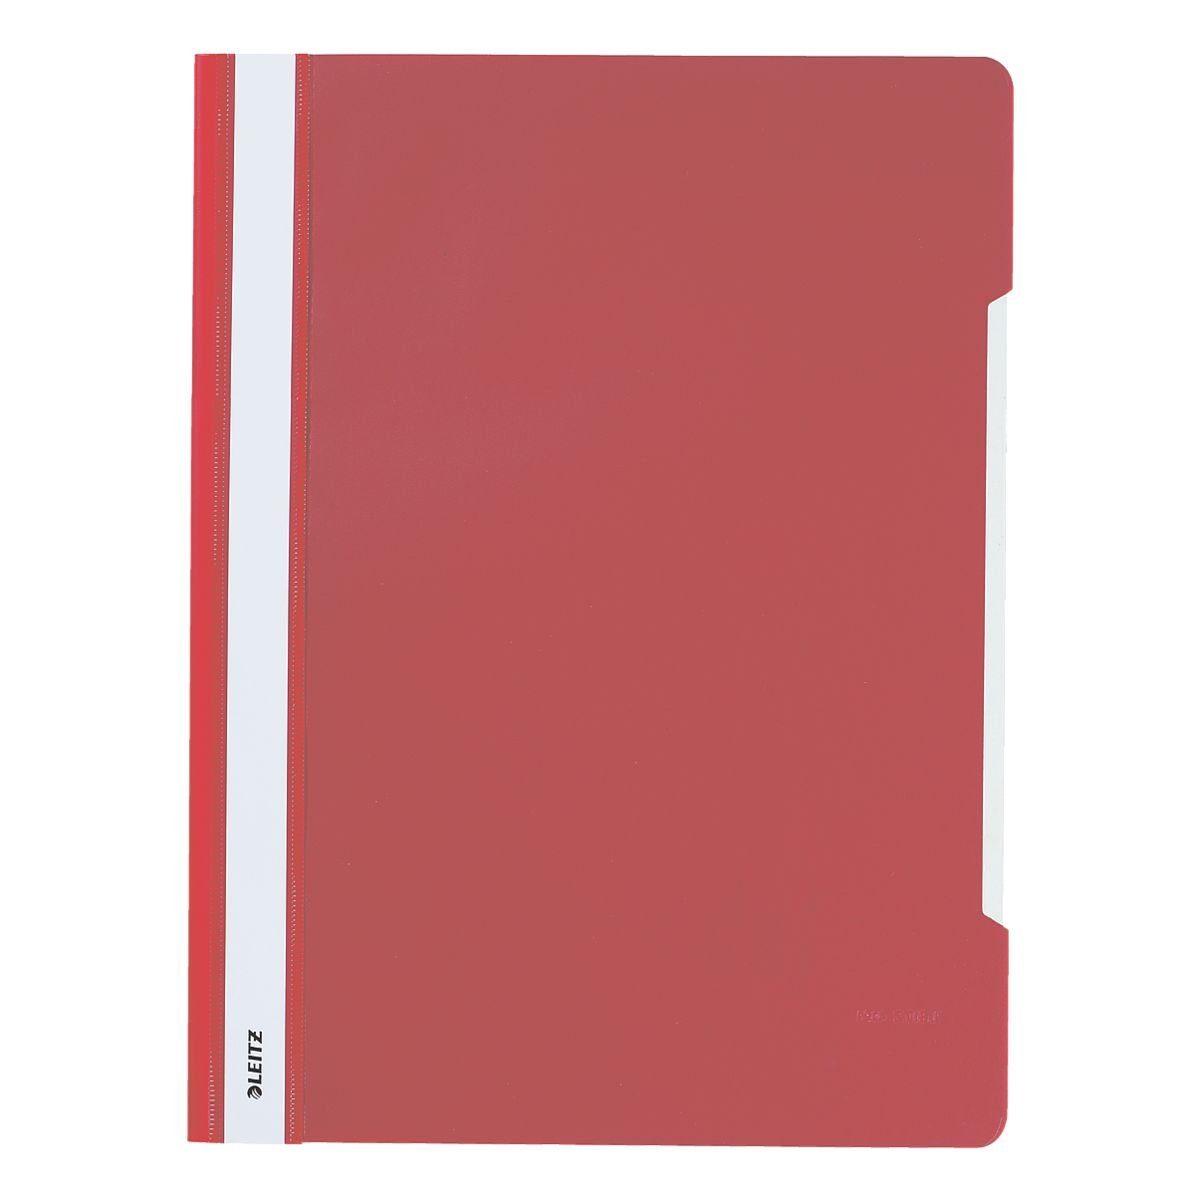 Schnellhefter Sichthefter Leitz 10 Stück In Hellgrün 4191 50 Papier, Büro- & Schreibwaren